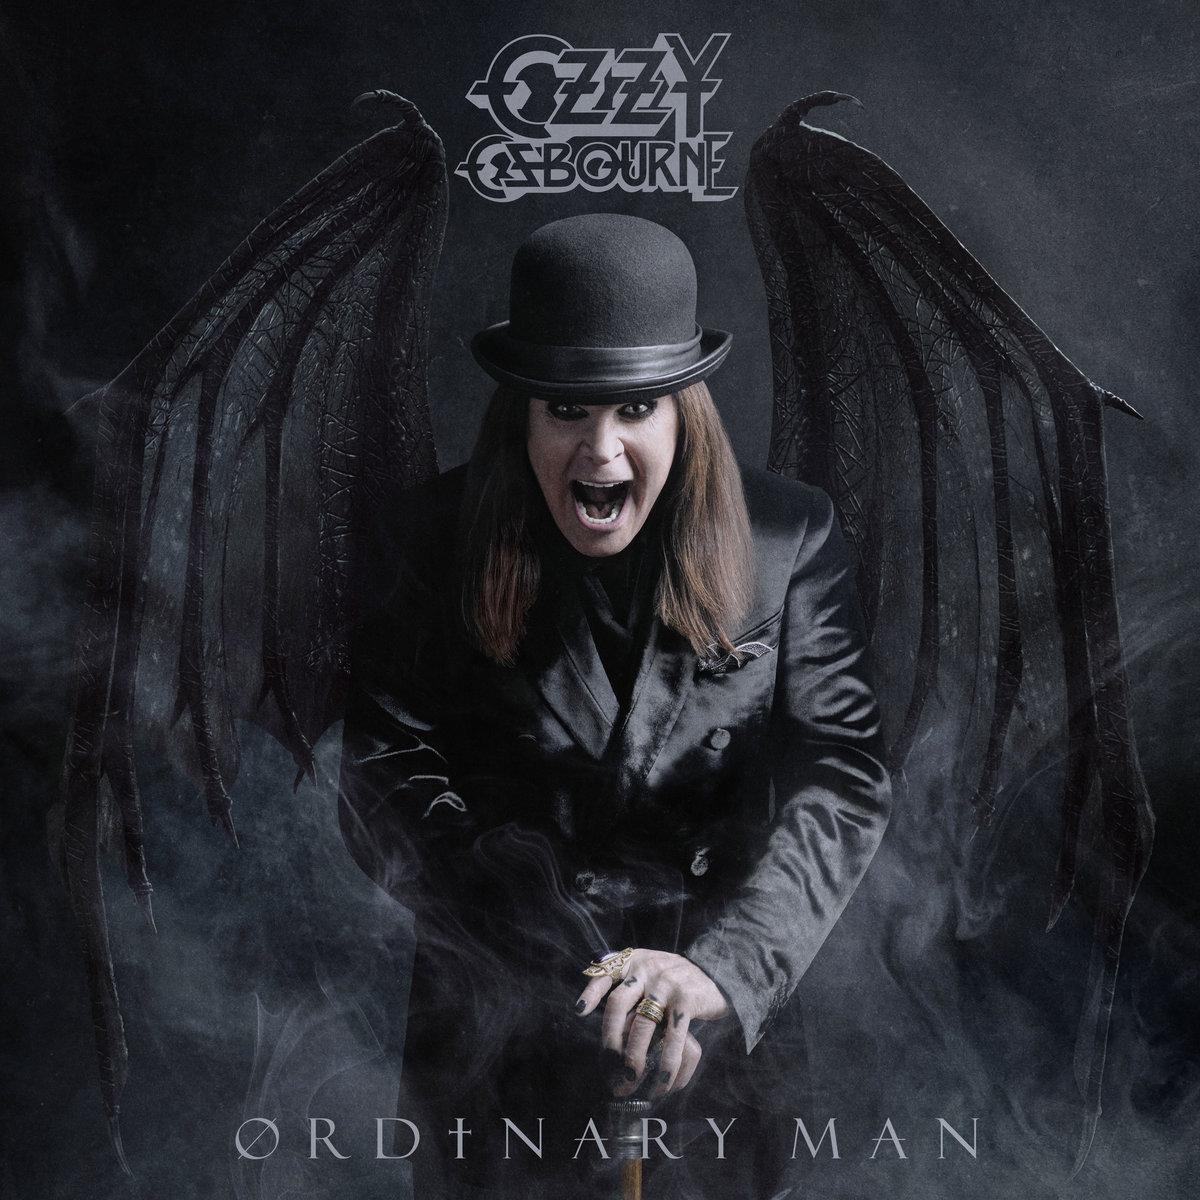 Osbourne Ozzy – Ordinary Man